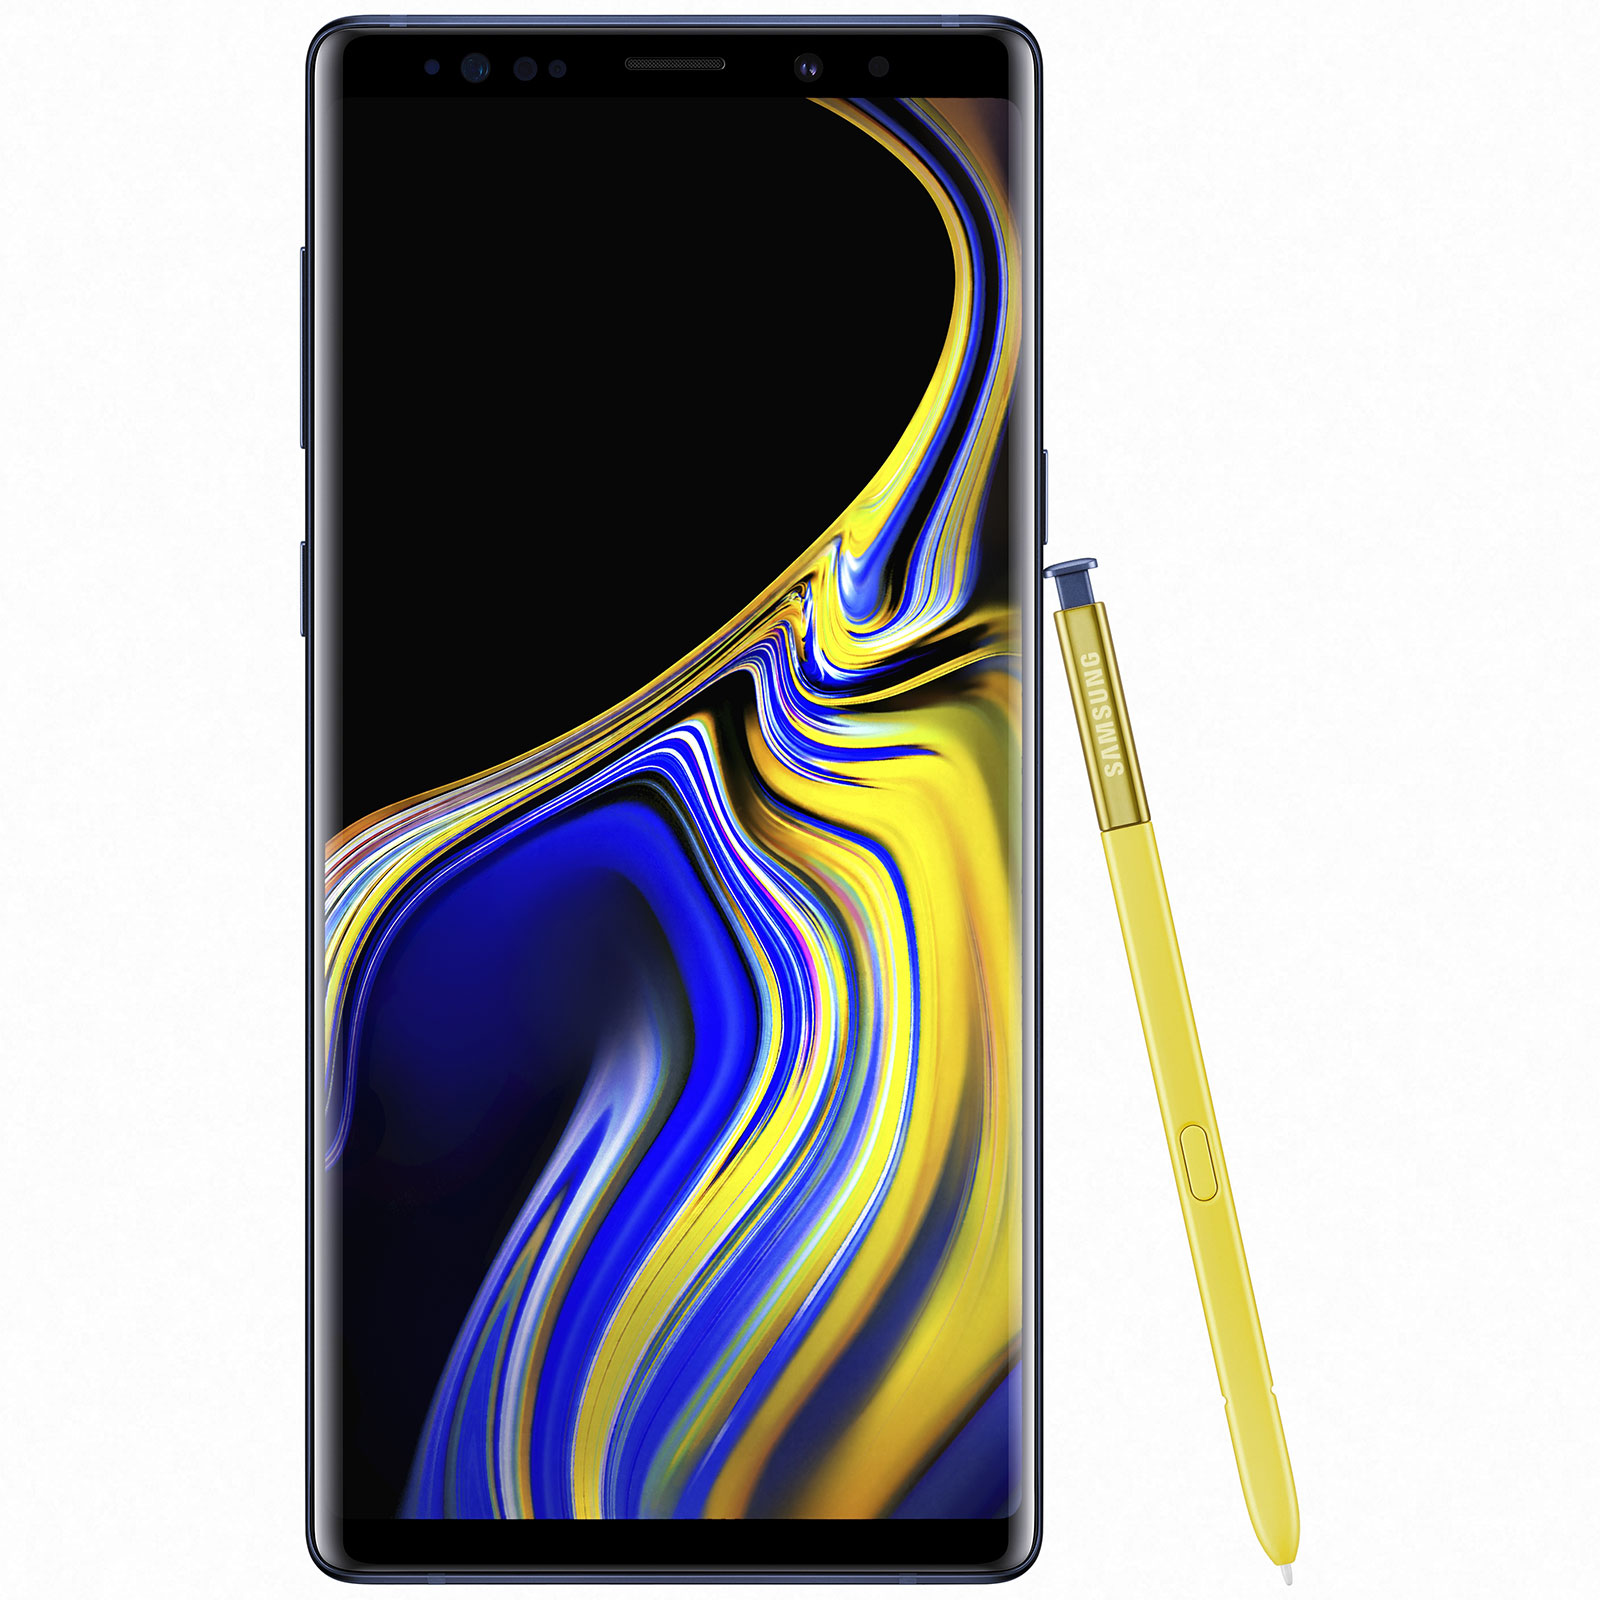 "Mobile & smartphone Samsung Galaxy Note 9 SM-N960 Bleu Cobalt (6 Go / 128 Go) Smartphone 4G-LTE Advanced IP68 Dual SIM - Exynos 9810 8-Core 2.8 Ghz - RAM 6 Go - Ecran tactile 6.4"" 1440 x 2960 - 128 Go - NFC/Bluetooth 5.0 - 4000 mAh - Android 8.1"